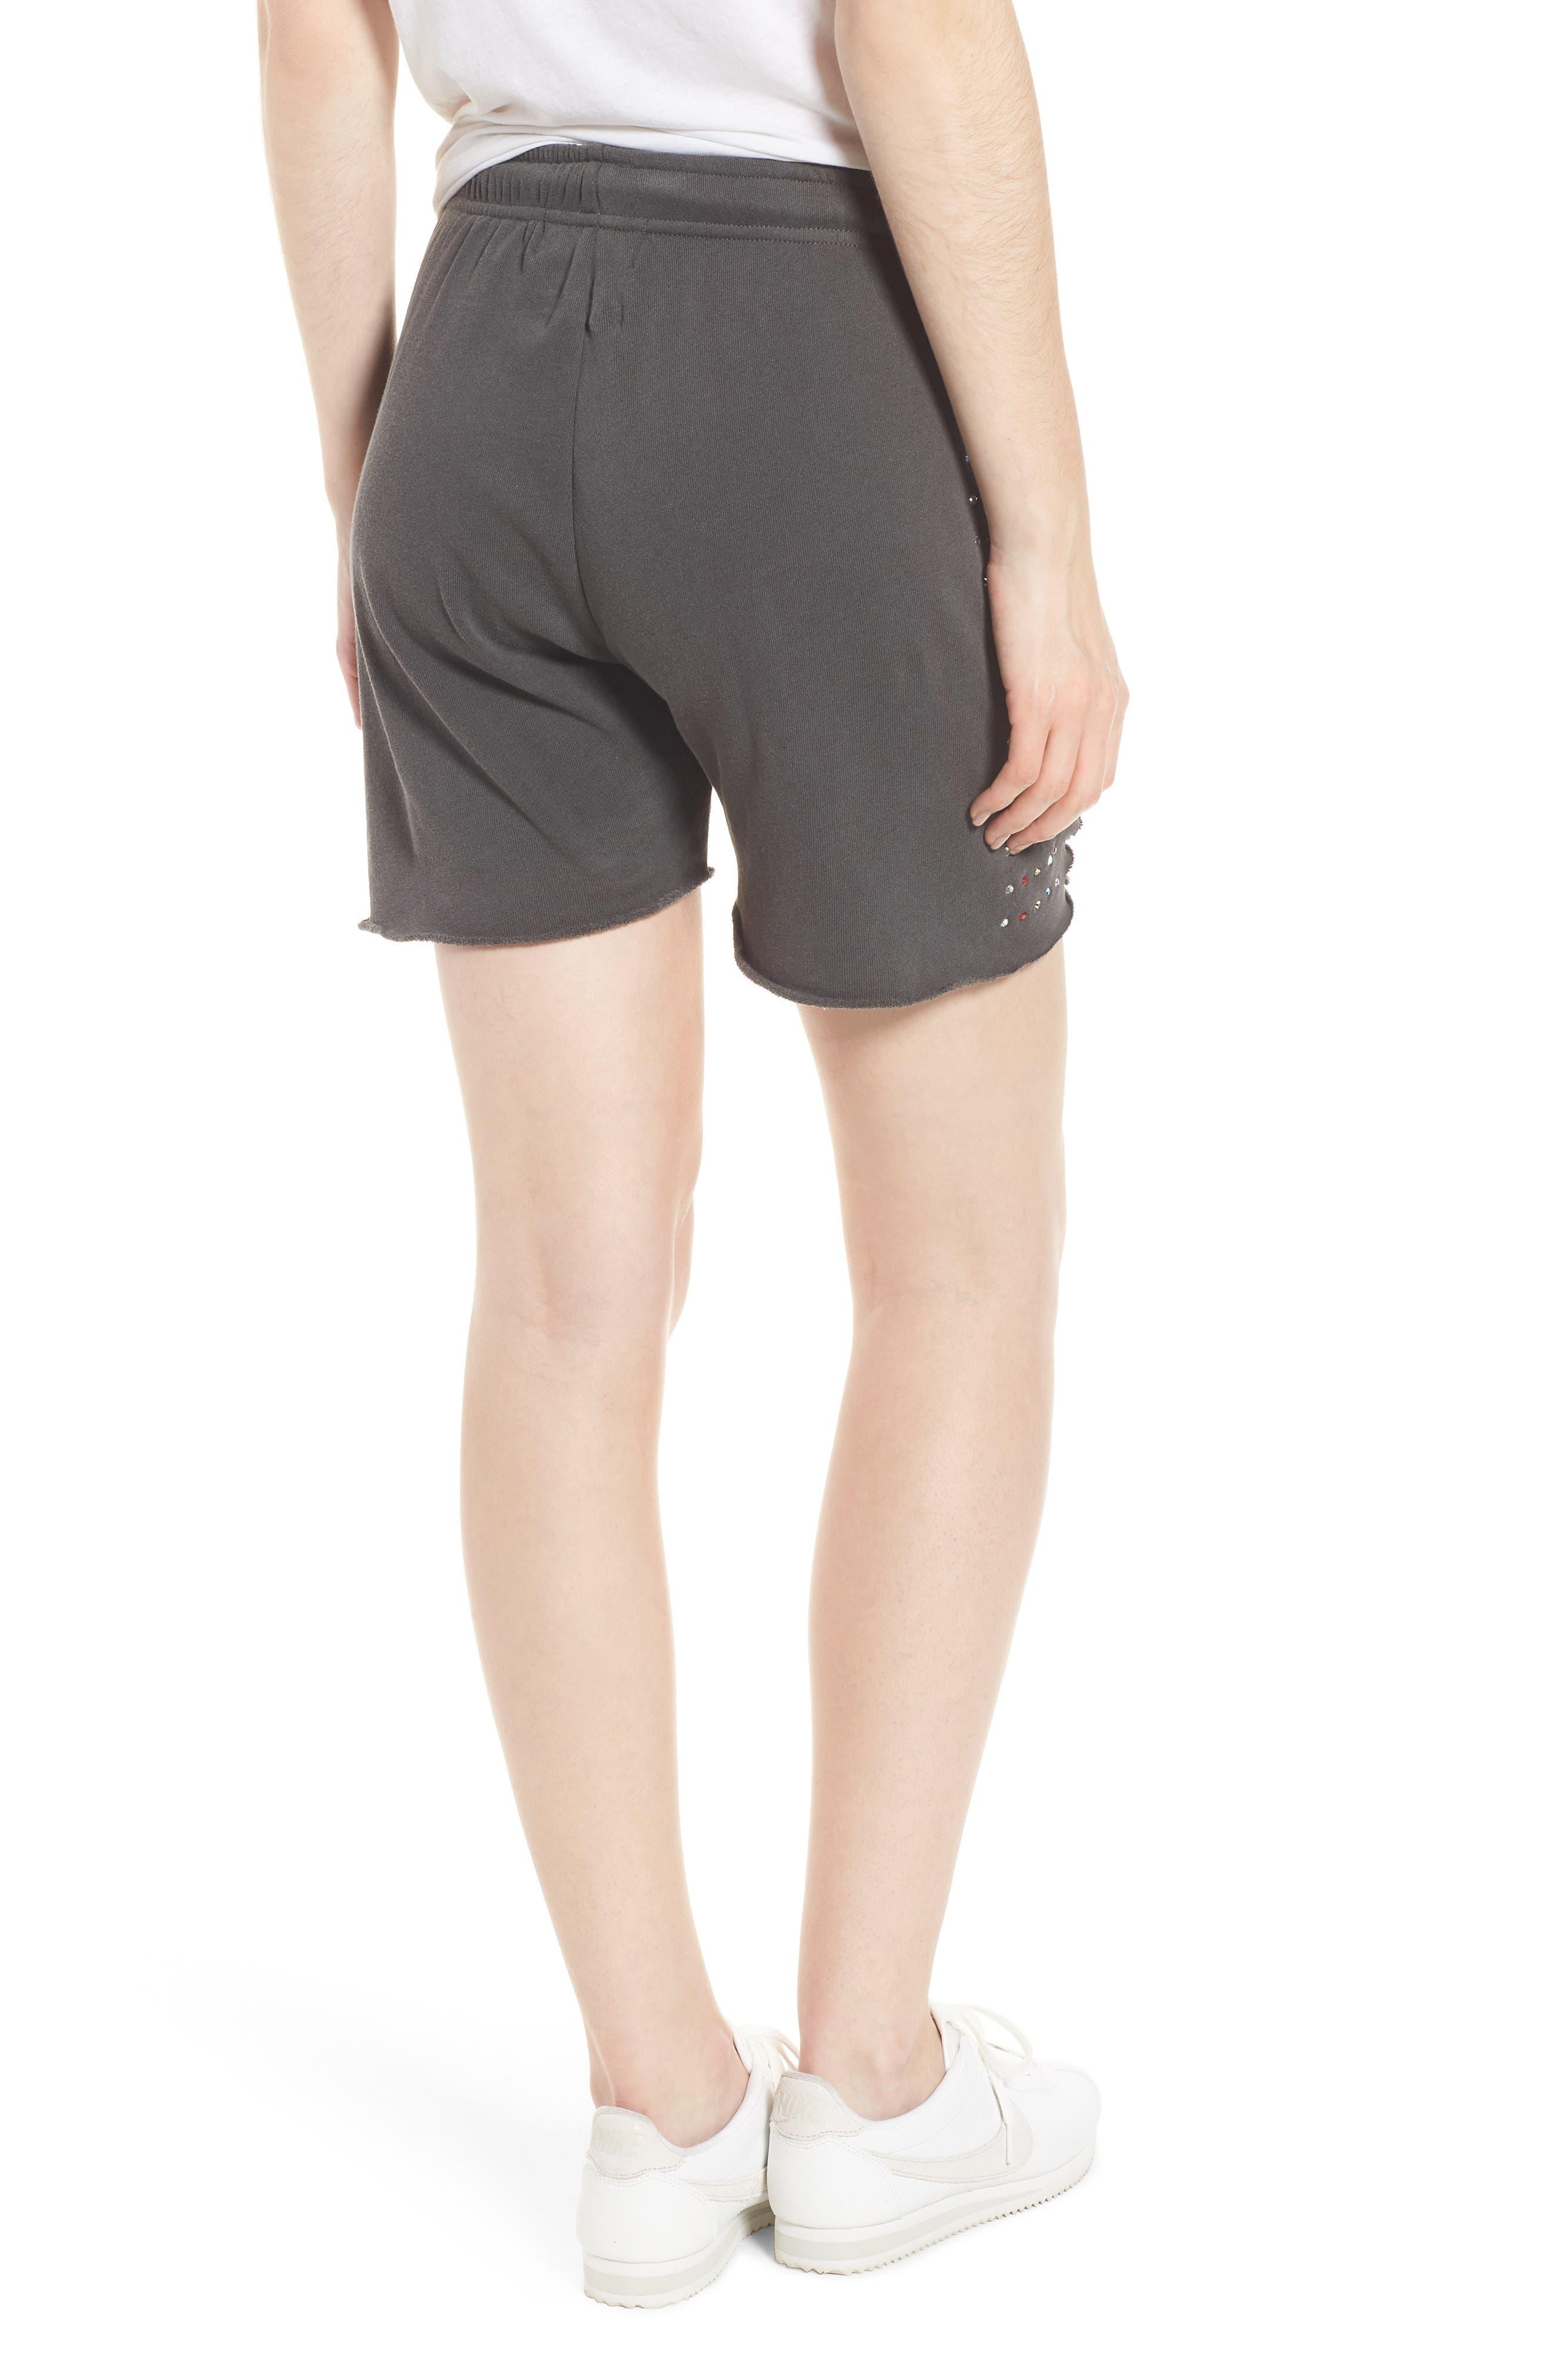 Rainbow Glitz Shorts,                             Alternate thumbnail 2, color,                             Pigment Black